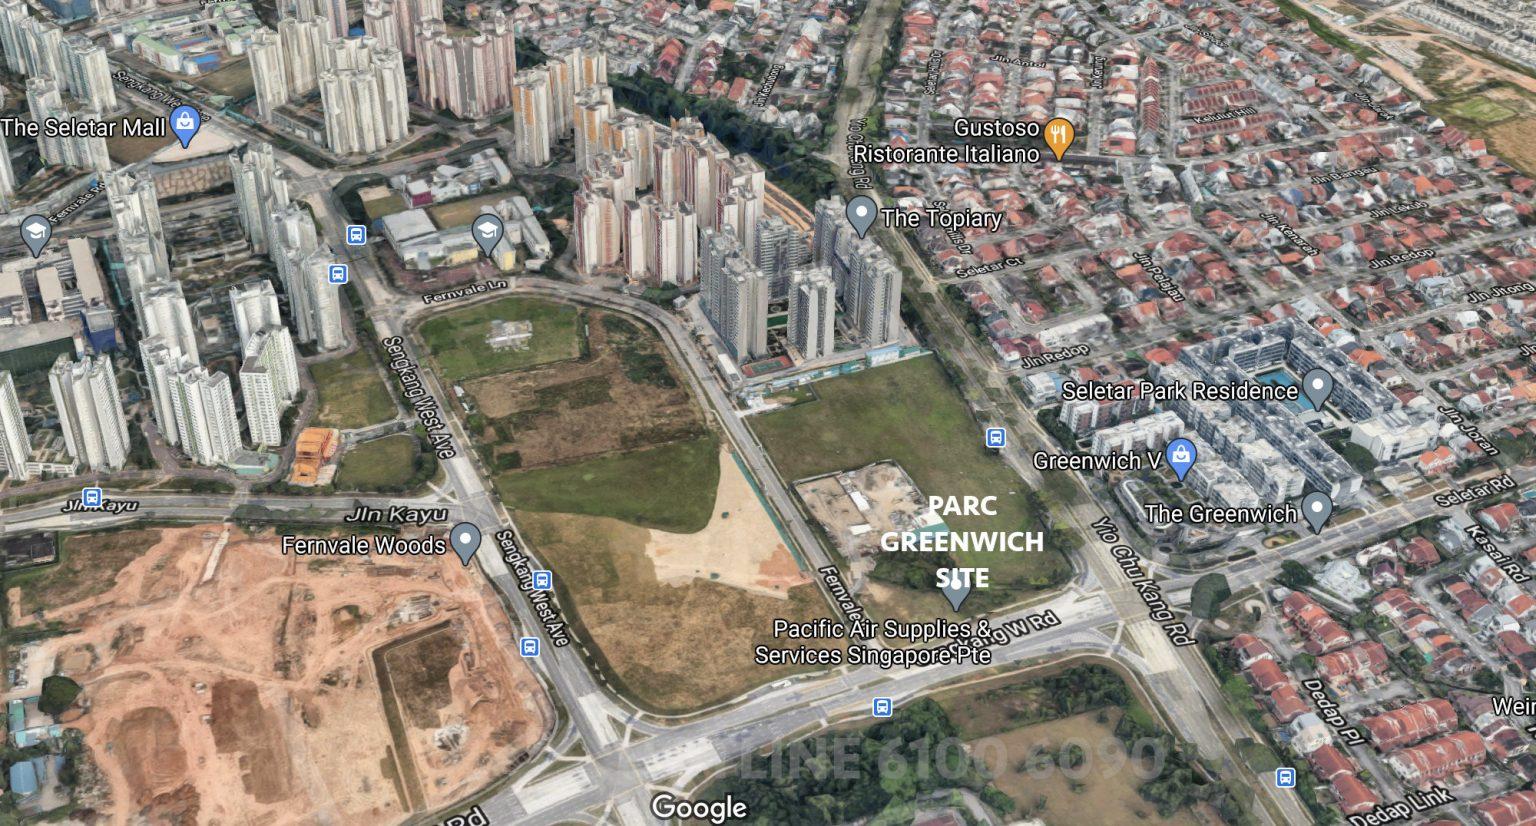 The-Parc-Greenwich-EC-Location-View-of-Neighbourhood-1536x826